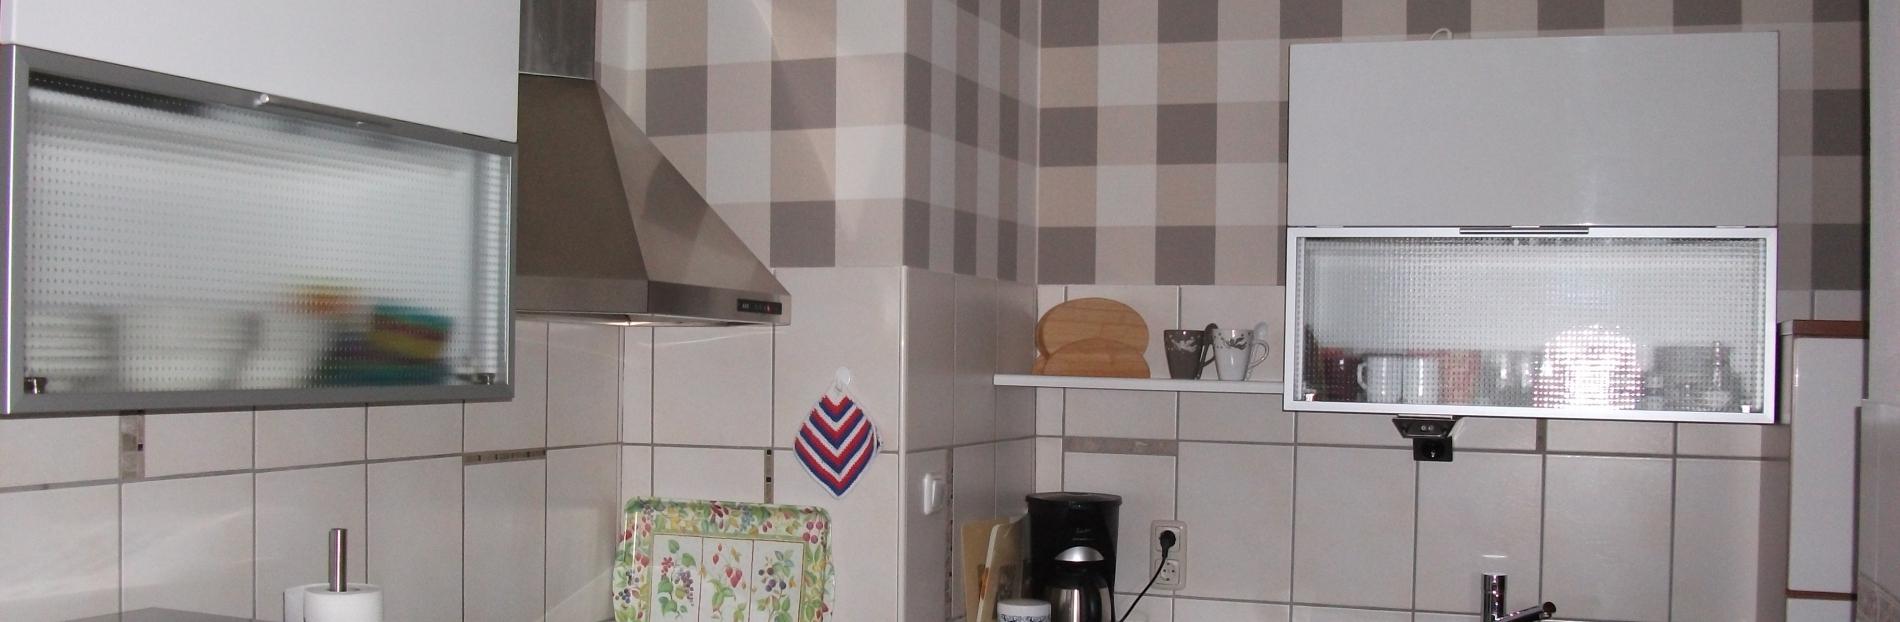 Seerose-Küche-Dezember-2016-1-e1481723140844